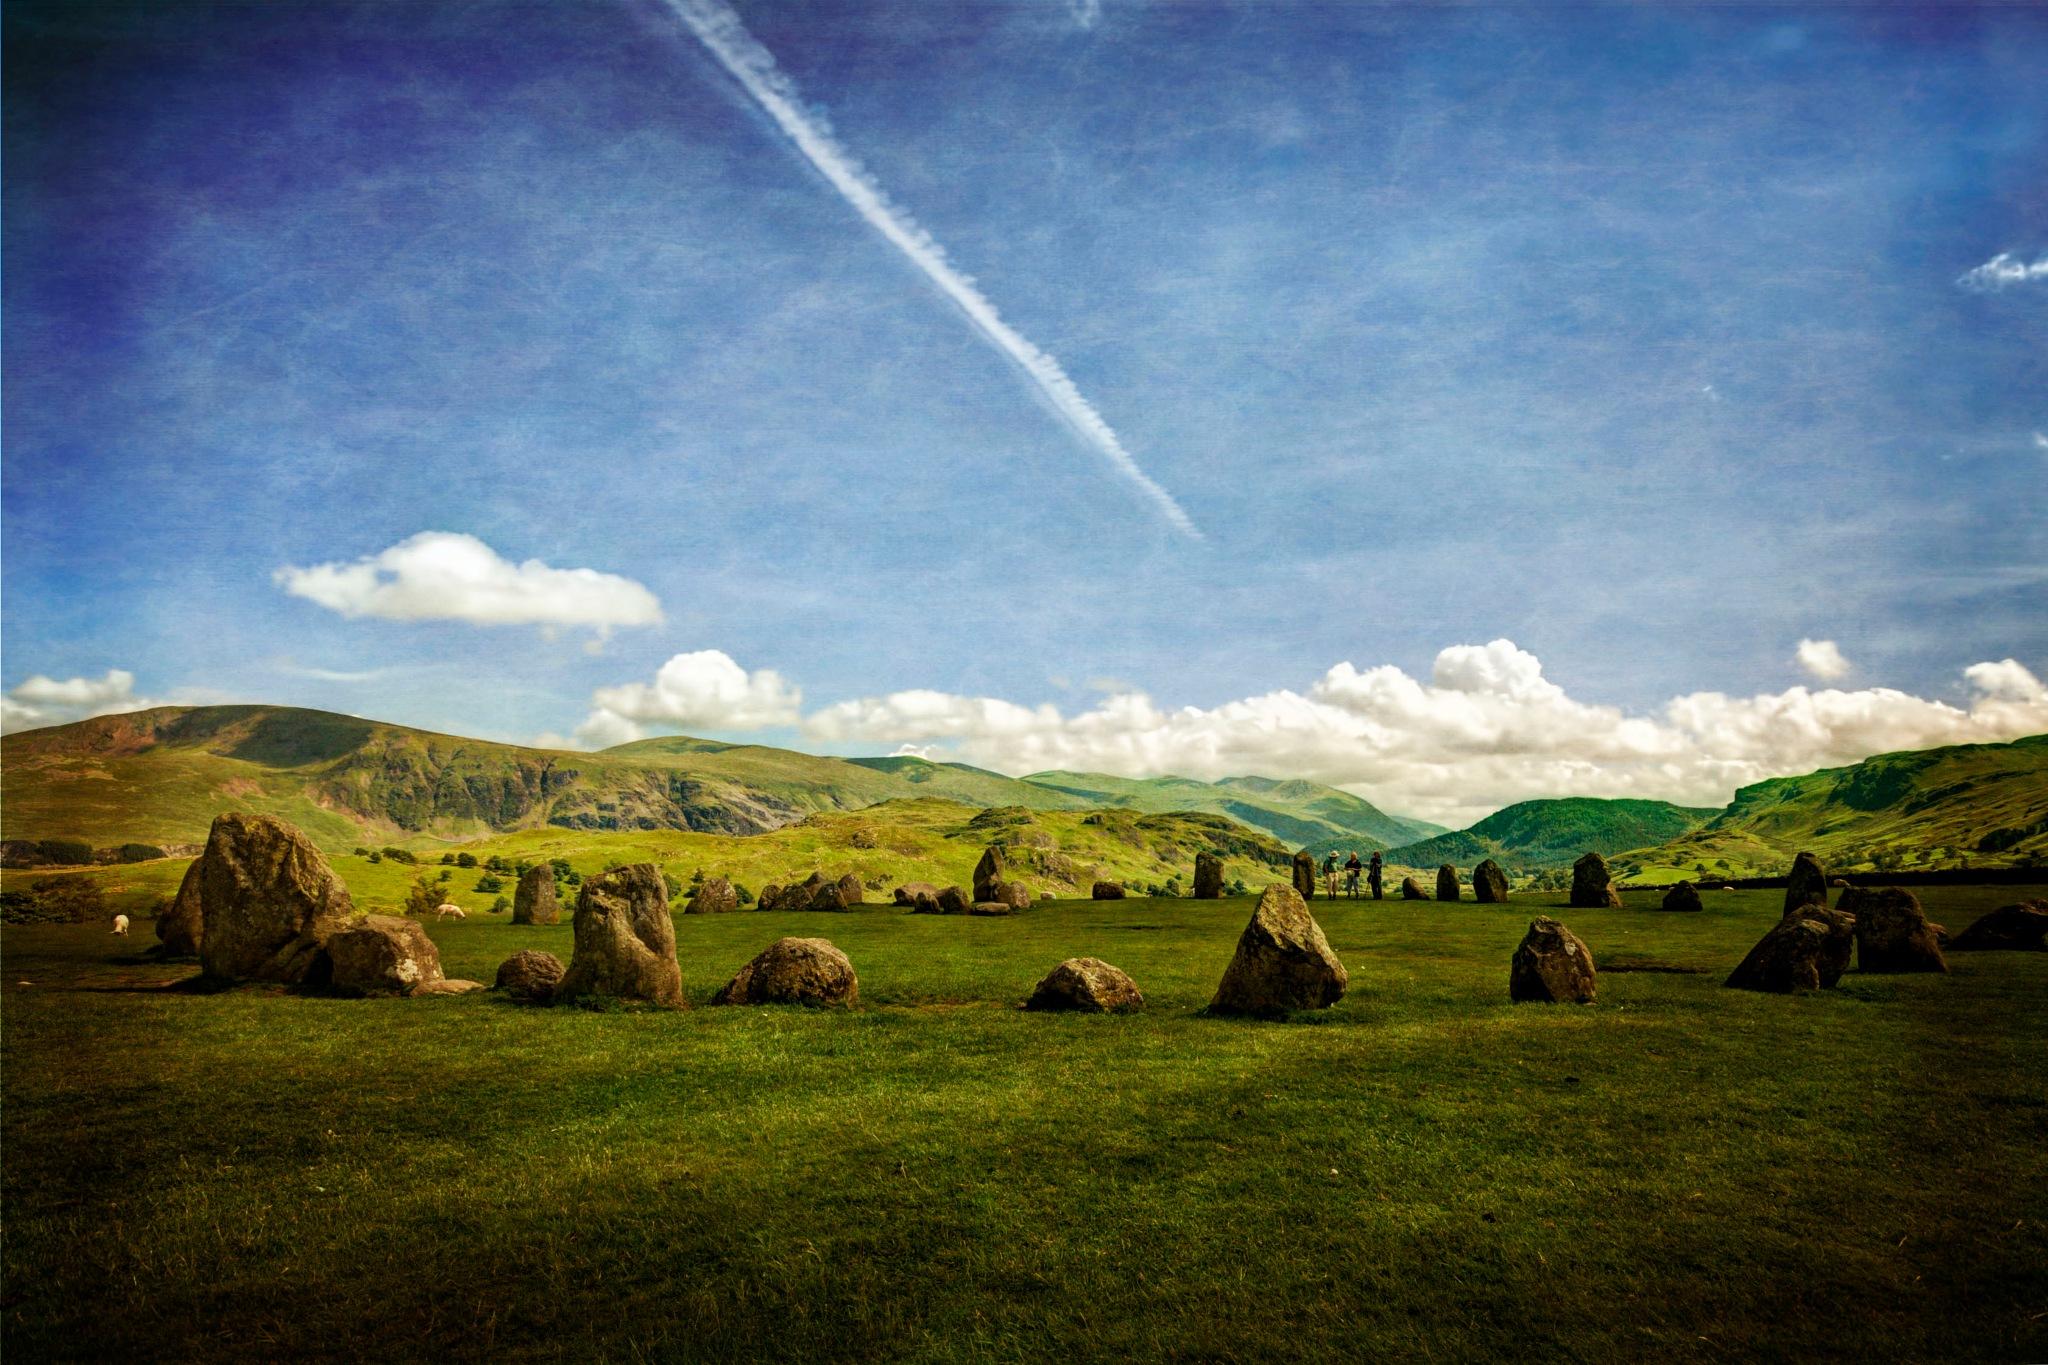 Castlerigg Standing Stones by Willpower